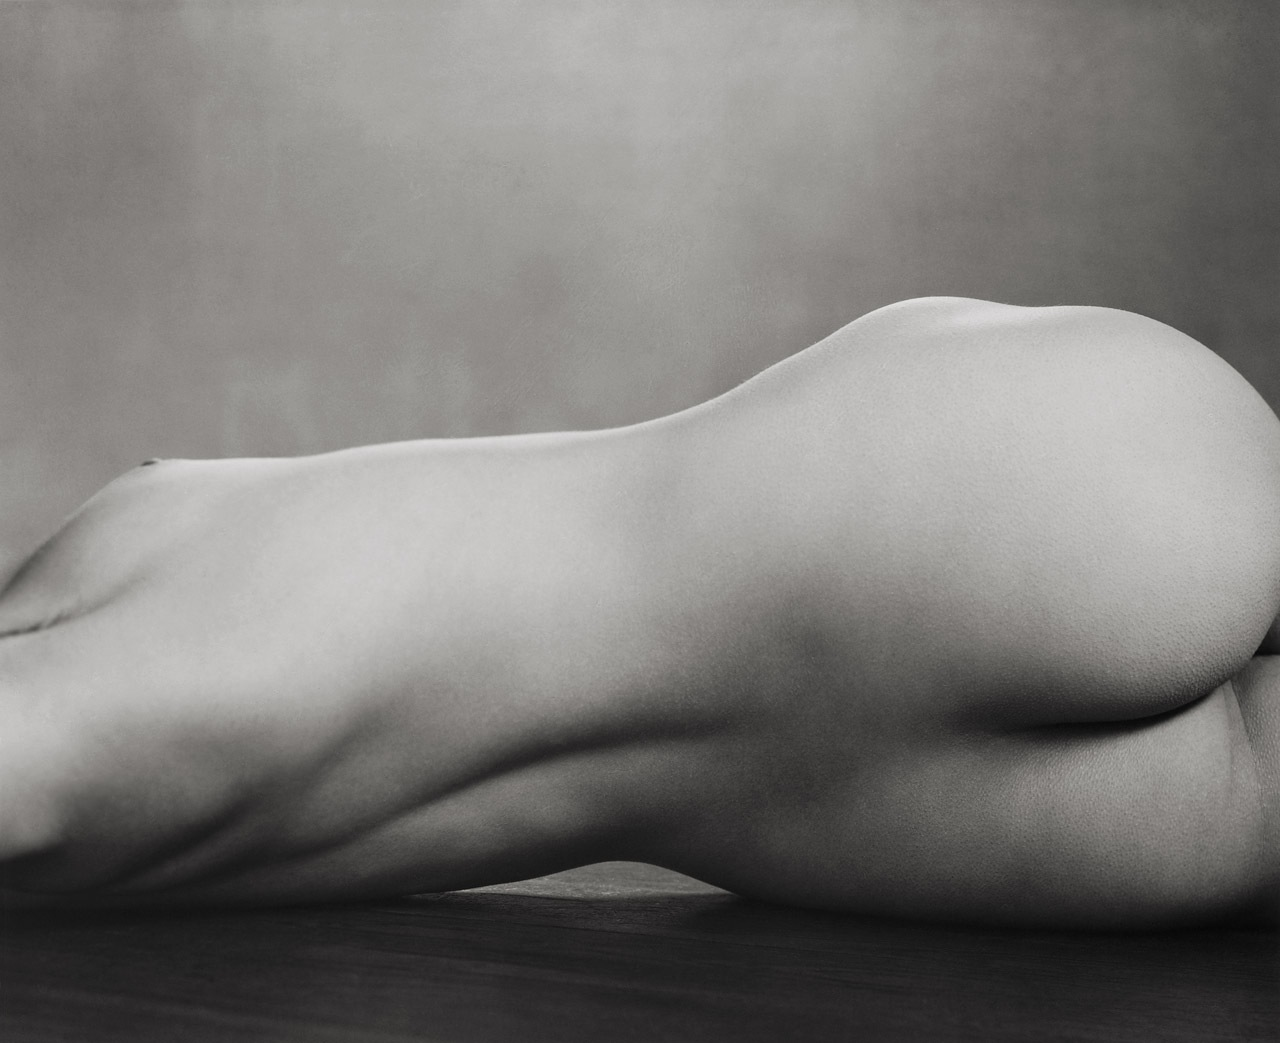 Edward_Weston-Torso-1925-thedoppelganger.jpeg